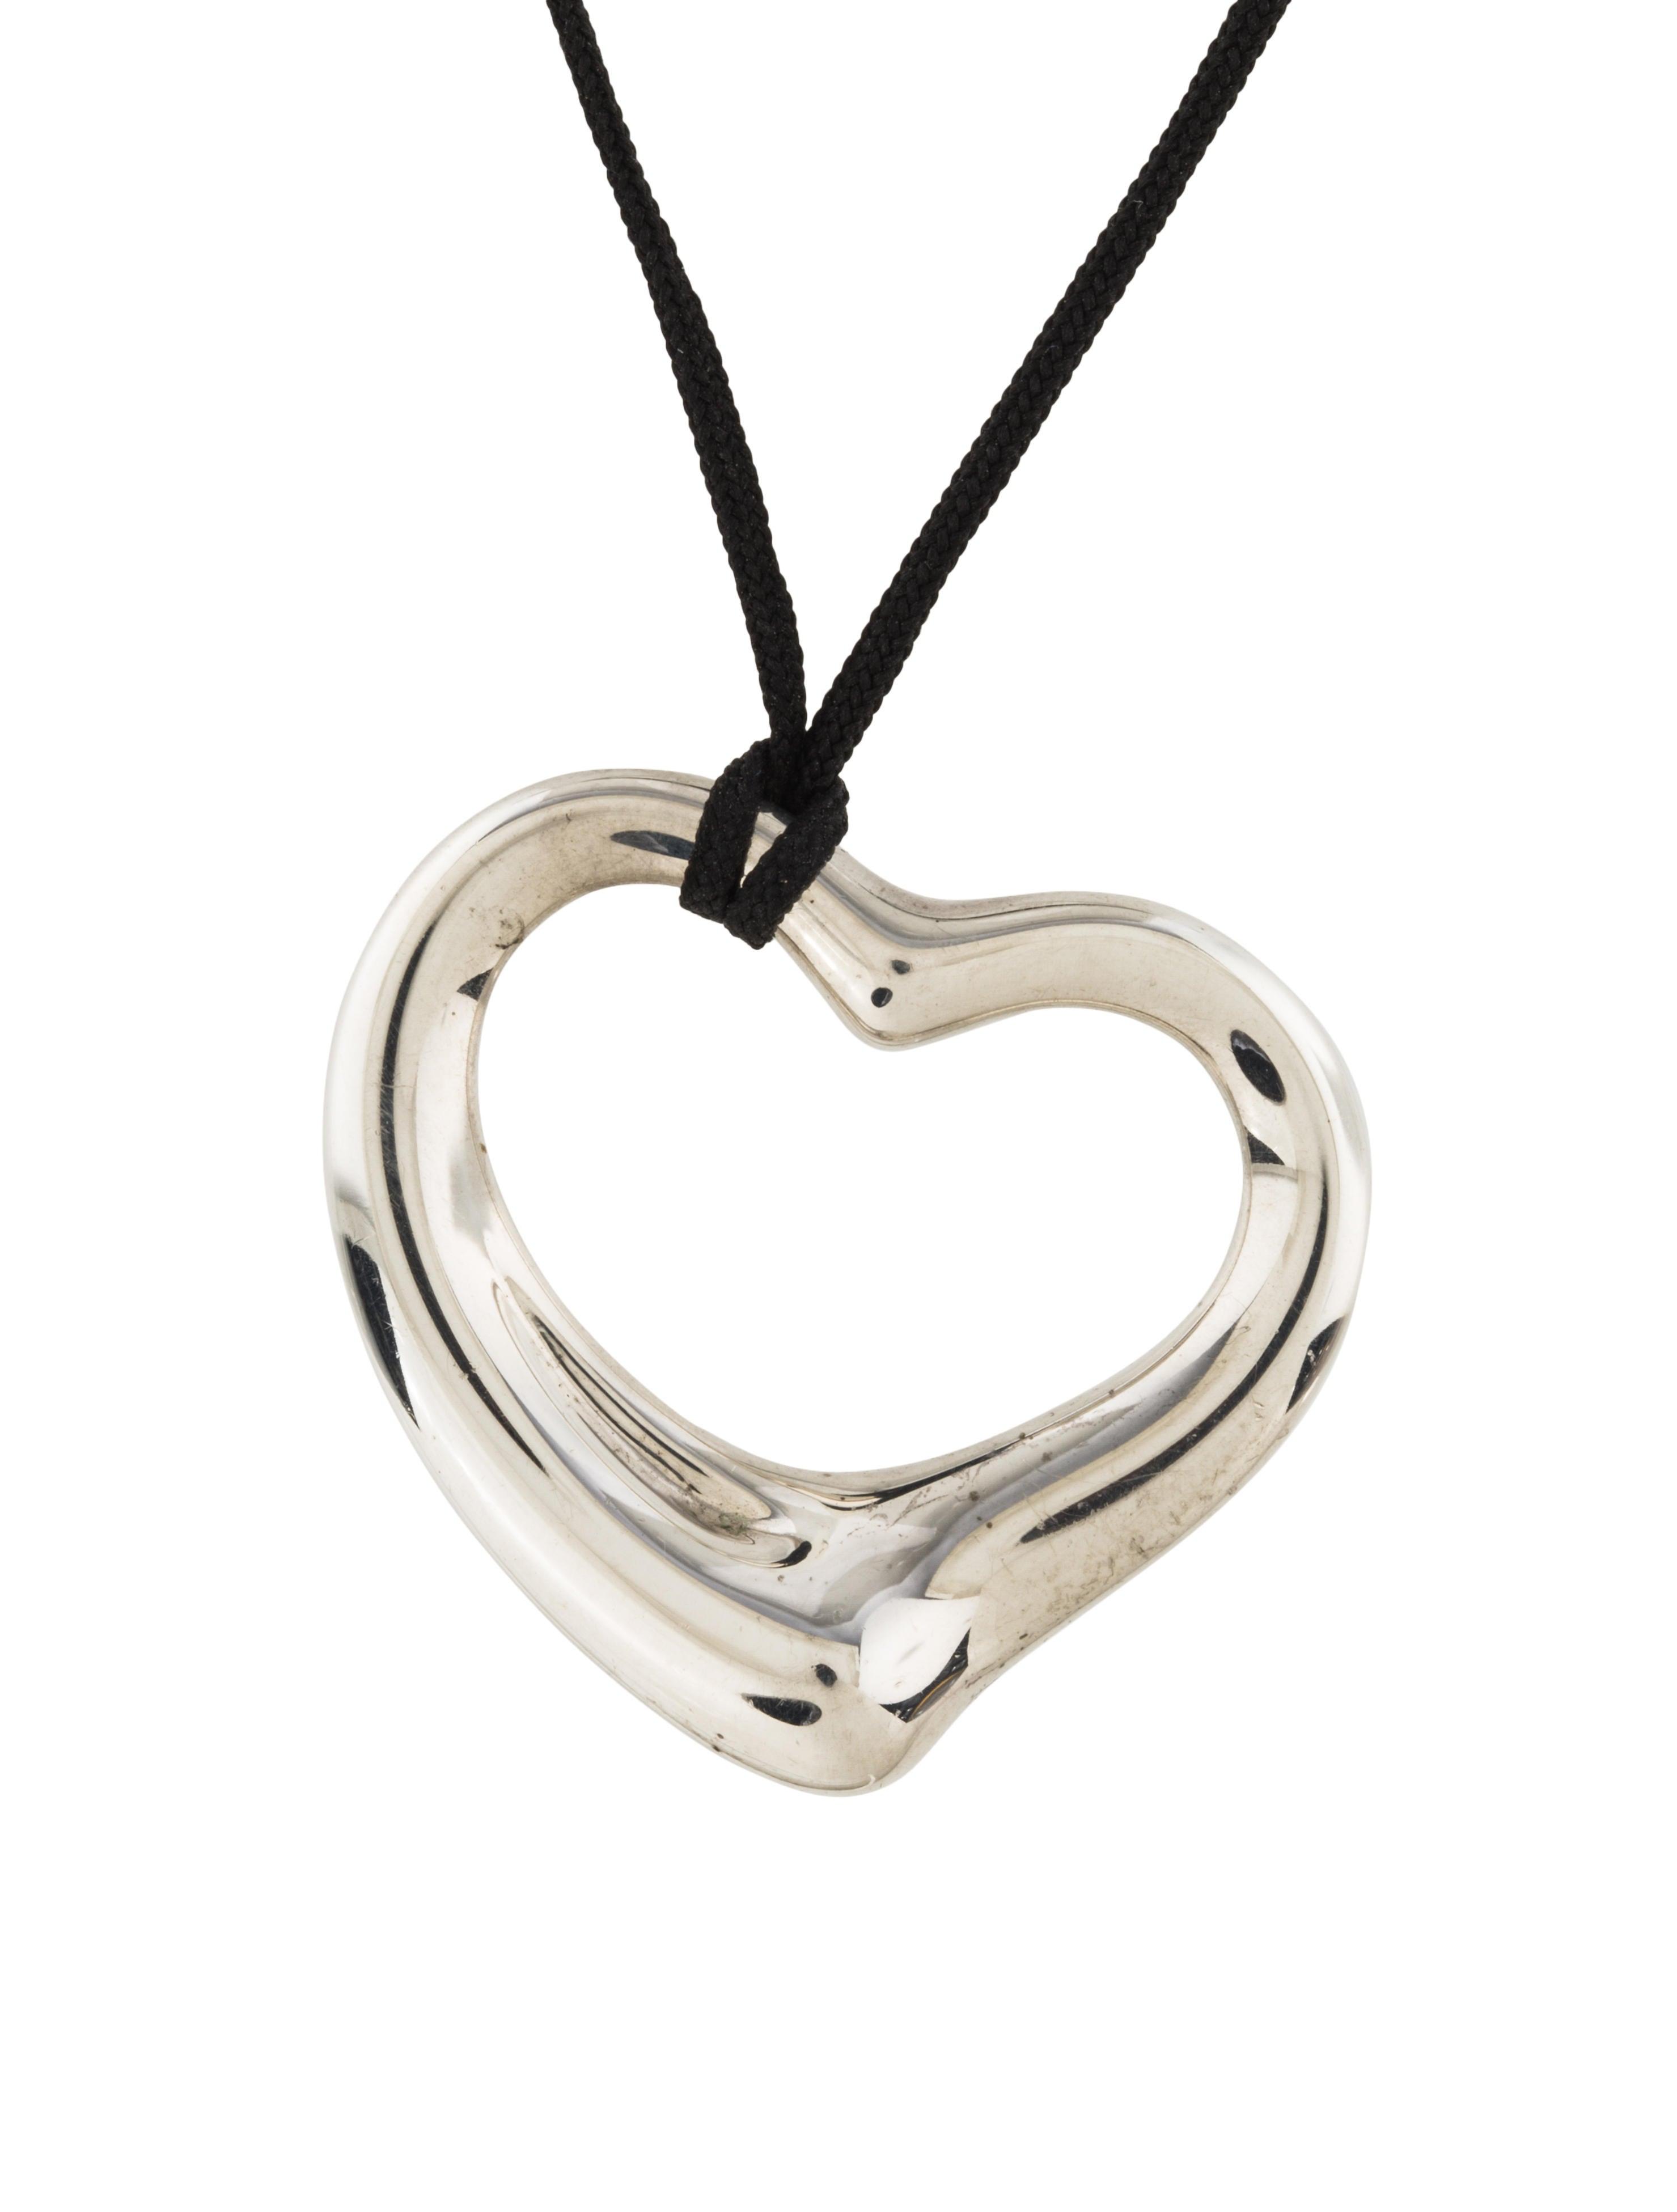 tiffany co open heart pendant necklace necklaces. Black Bedroom Furniture Sets. Home Design Ideas